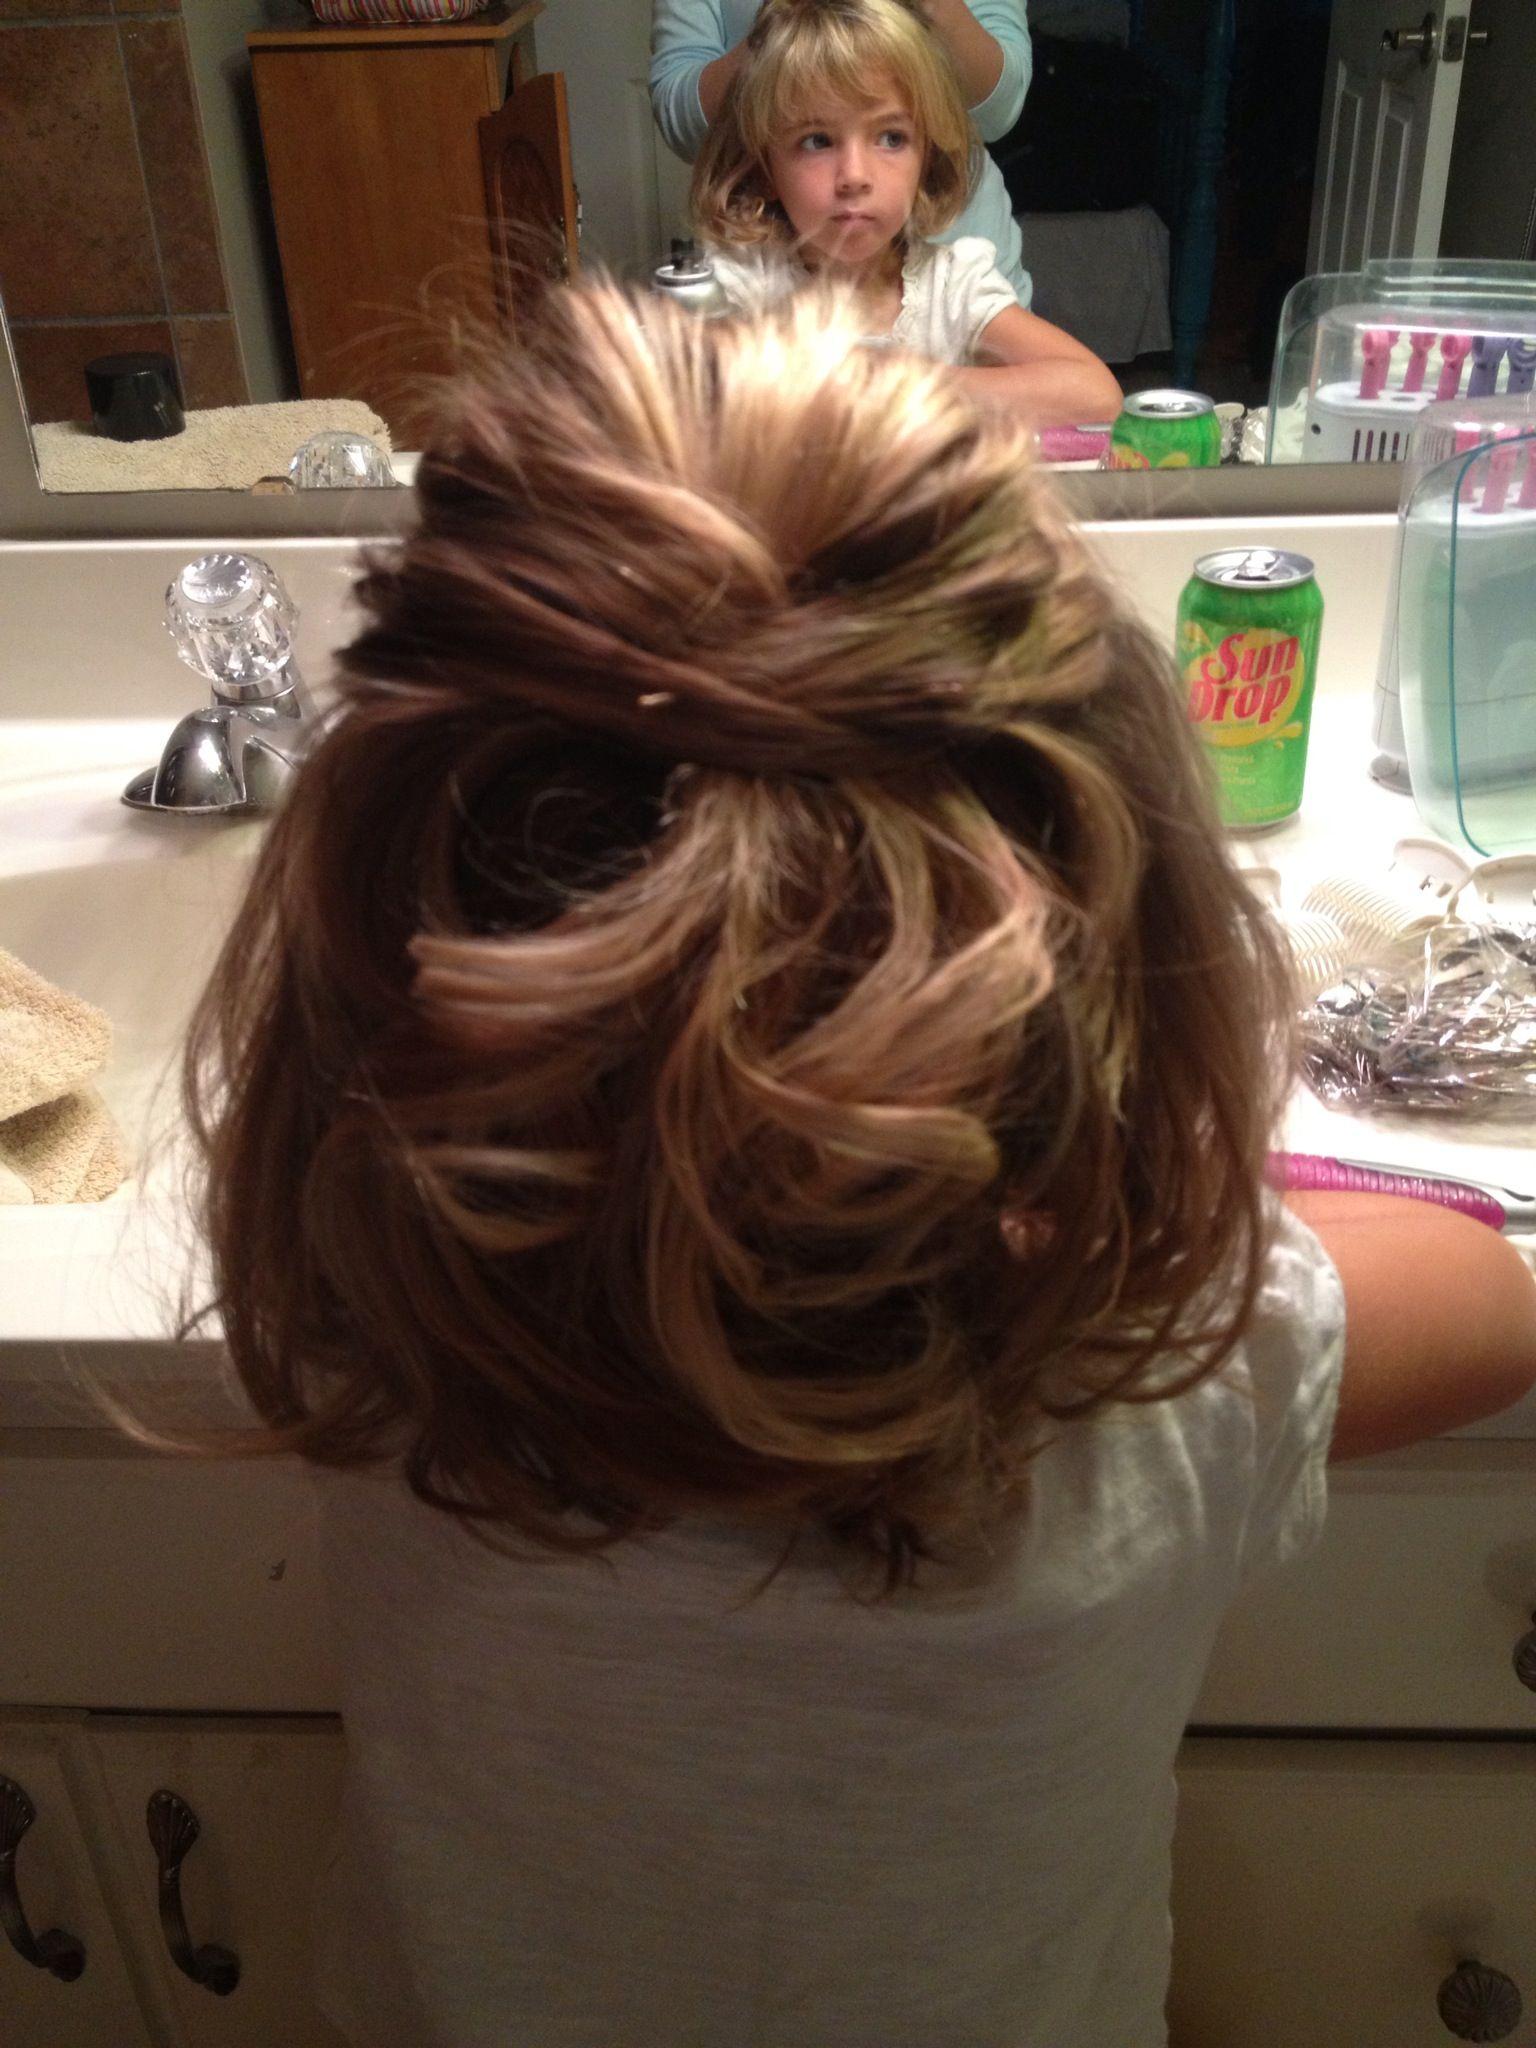 Sensational Wedding Hair Flowers Hair Flowers And Curls On Pinterest Short Hairstyles Gunalazisus